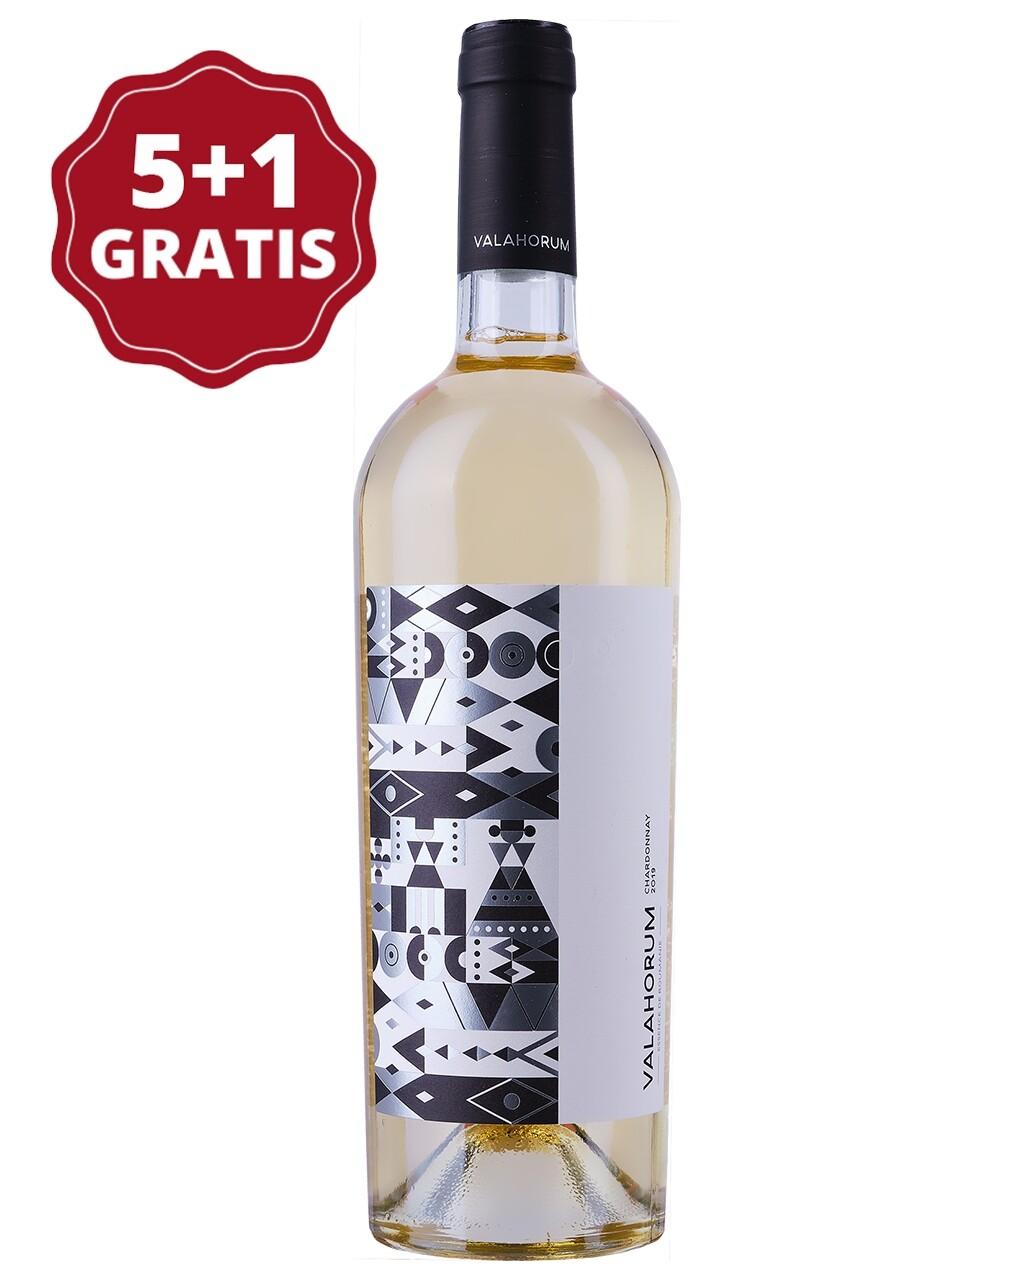 Valahorum Chardonnay 5+1